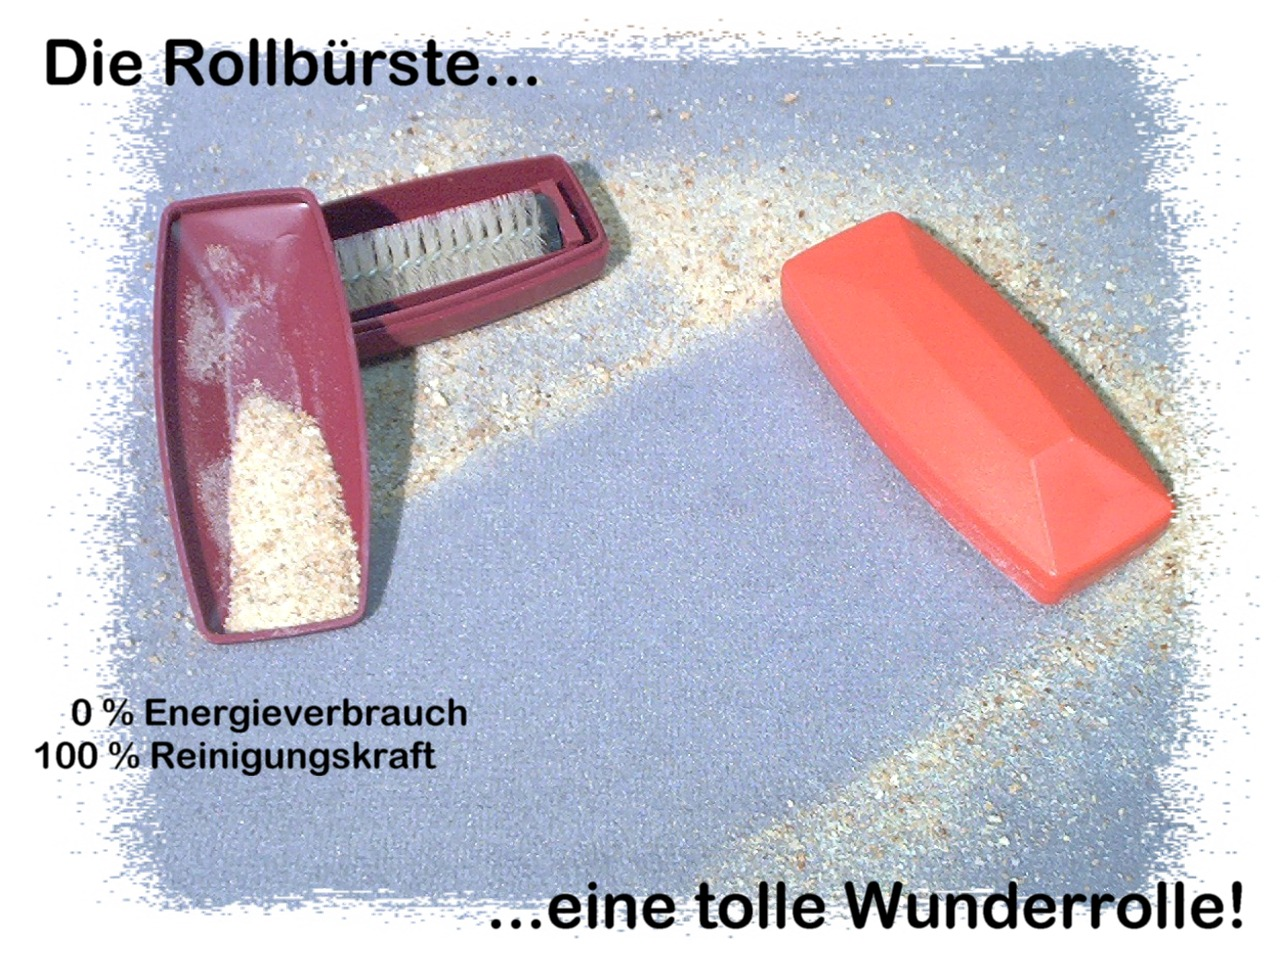 rollbuerste_prospekt_1